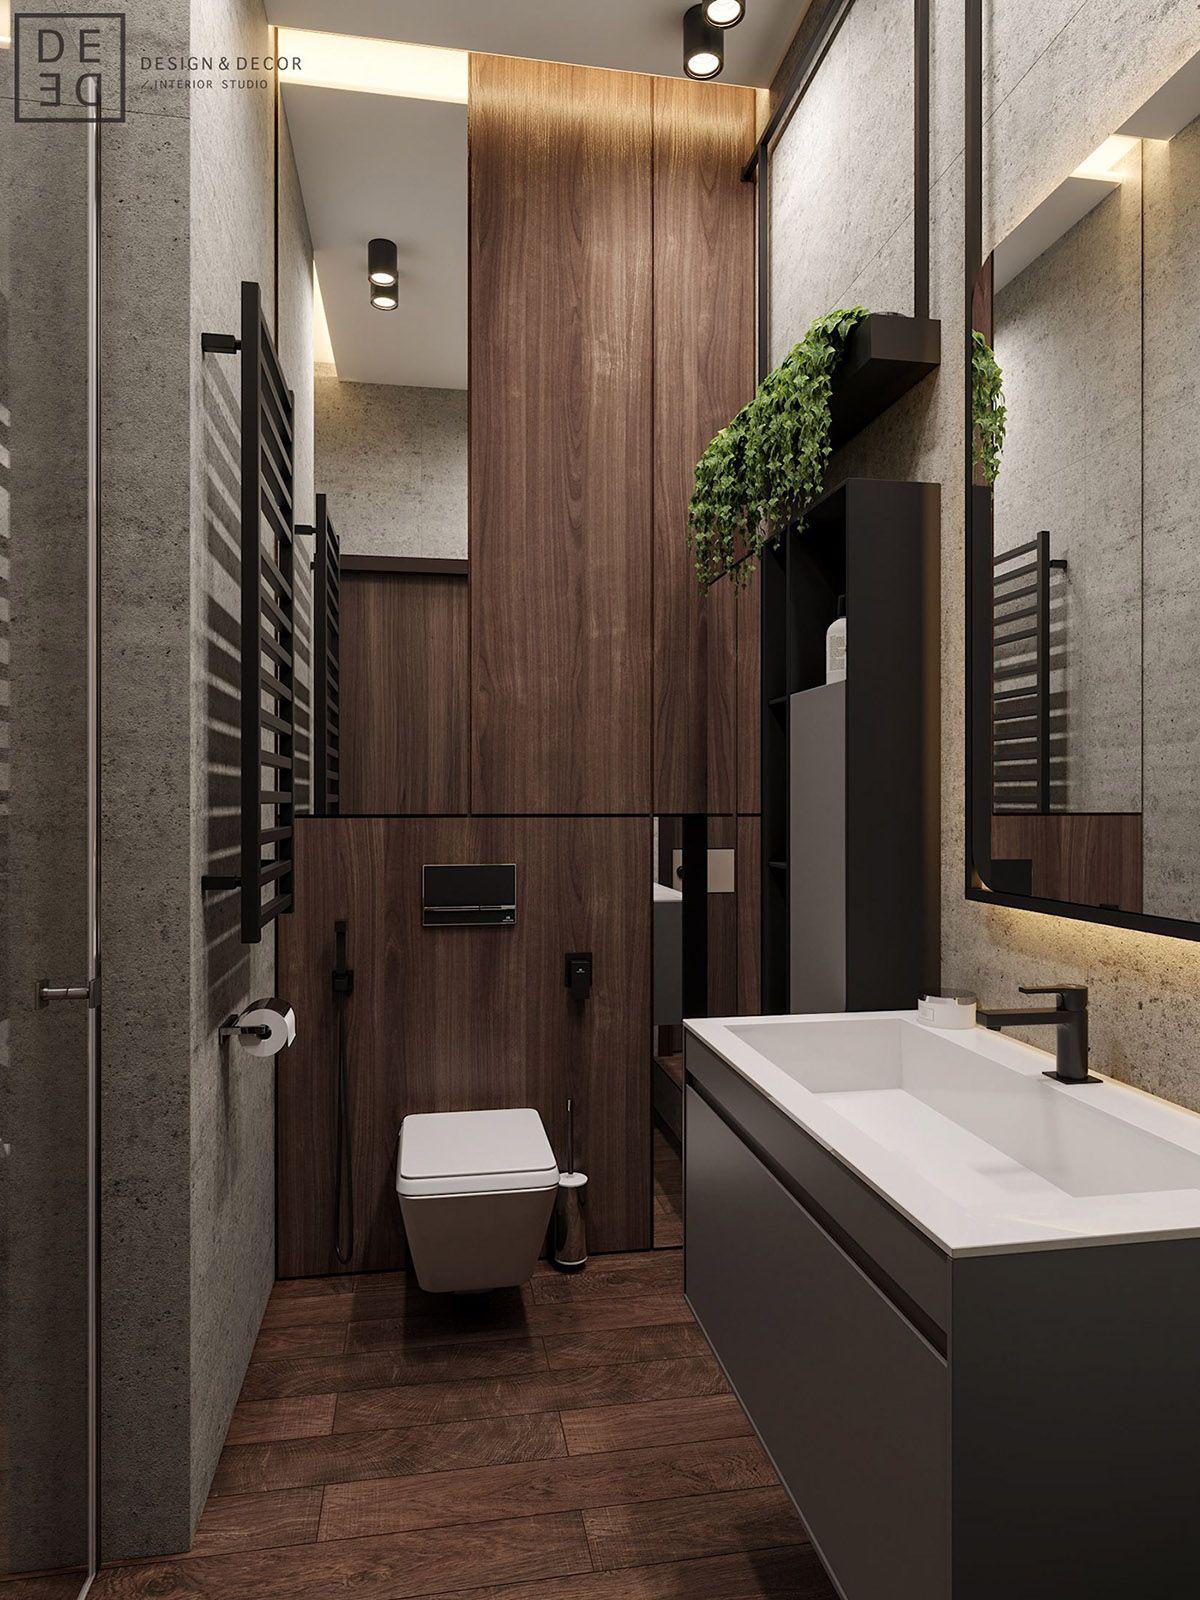 Best Luxurious Interior With Wood Slat Walls Luxury Interior 640 x 480